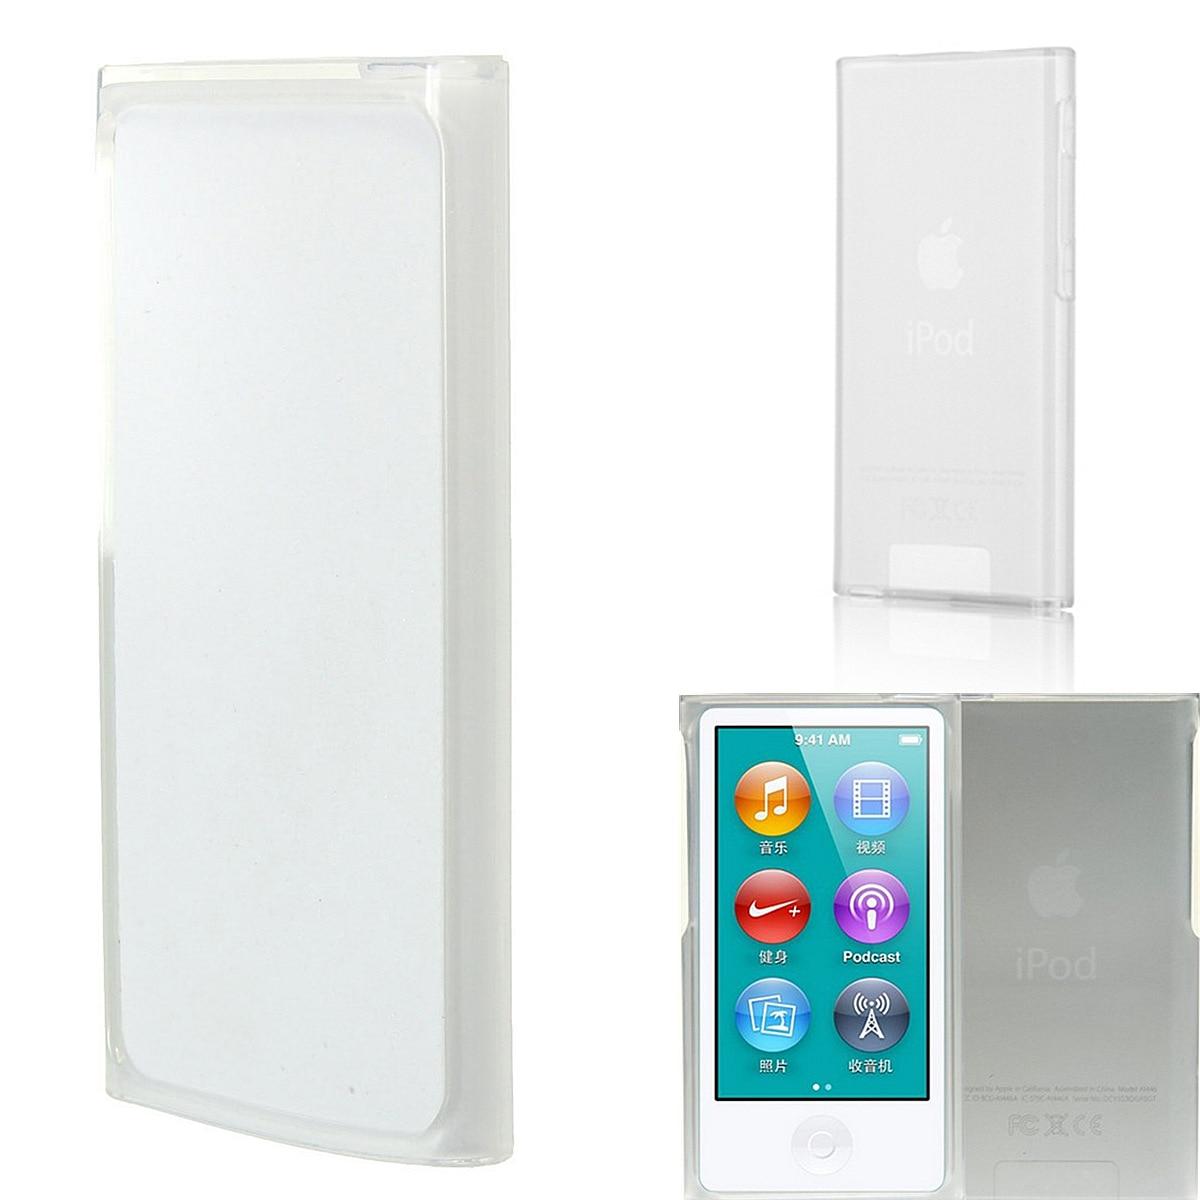 H1 TPU Rubber Skin Case For Apple iPod nano 7th Generation